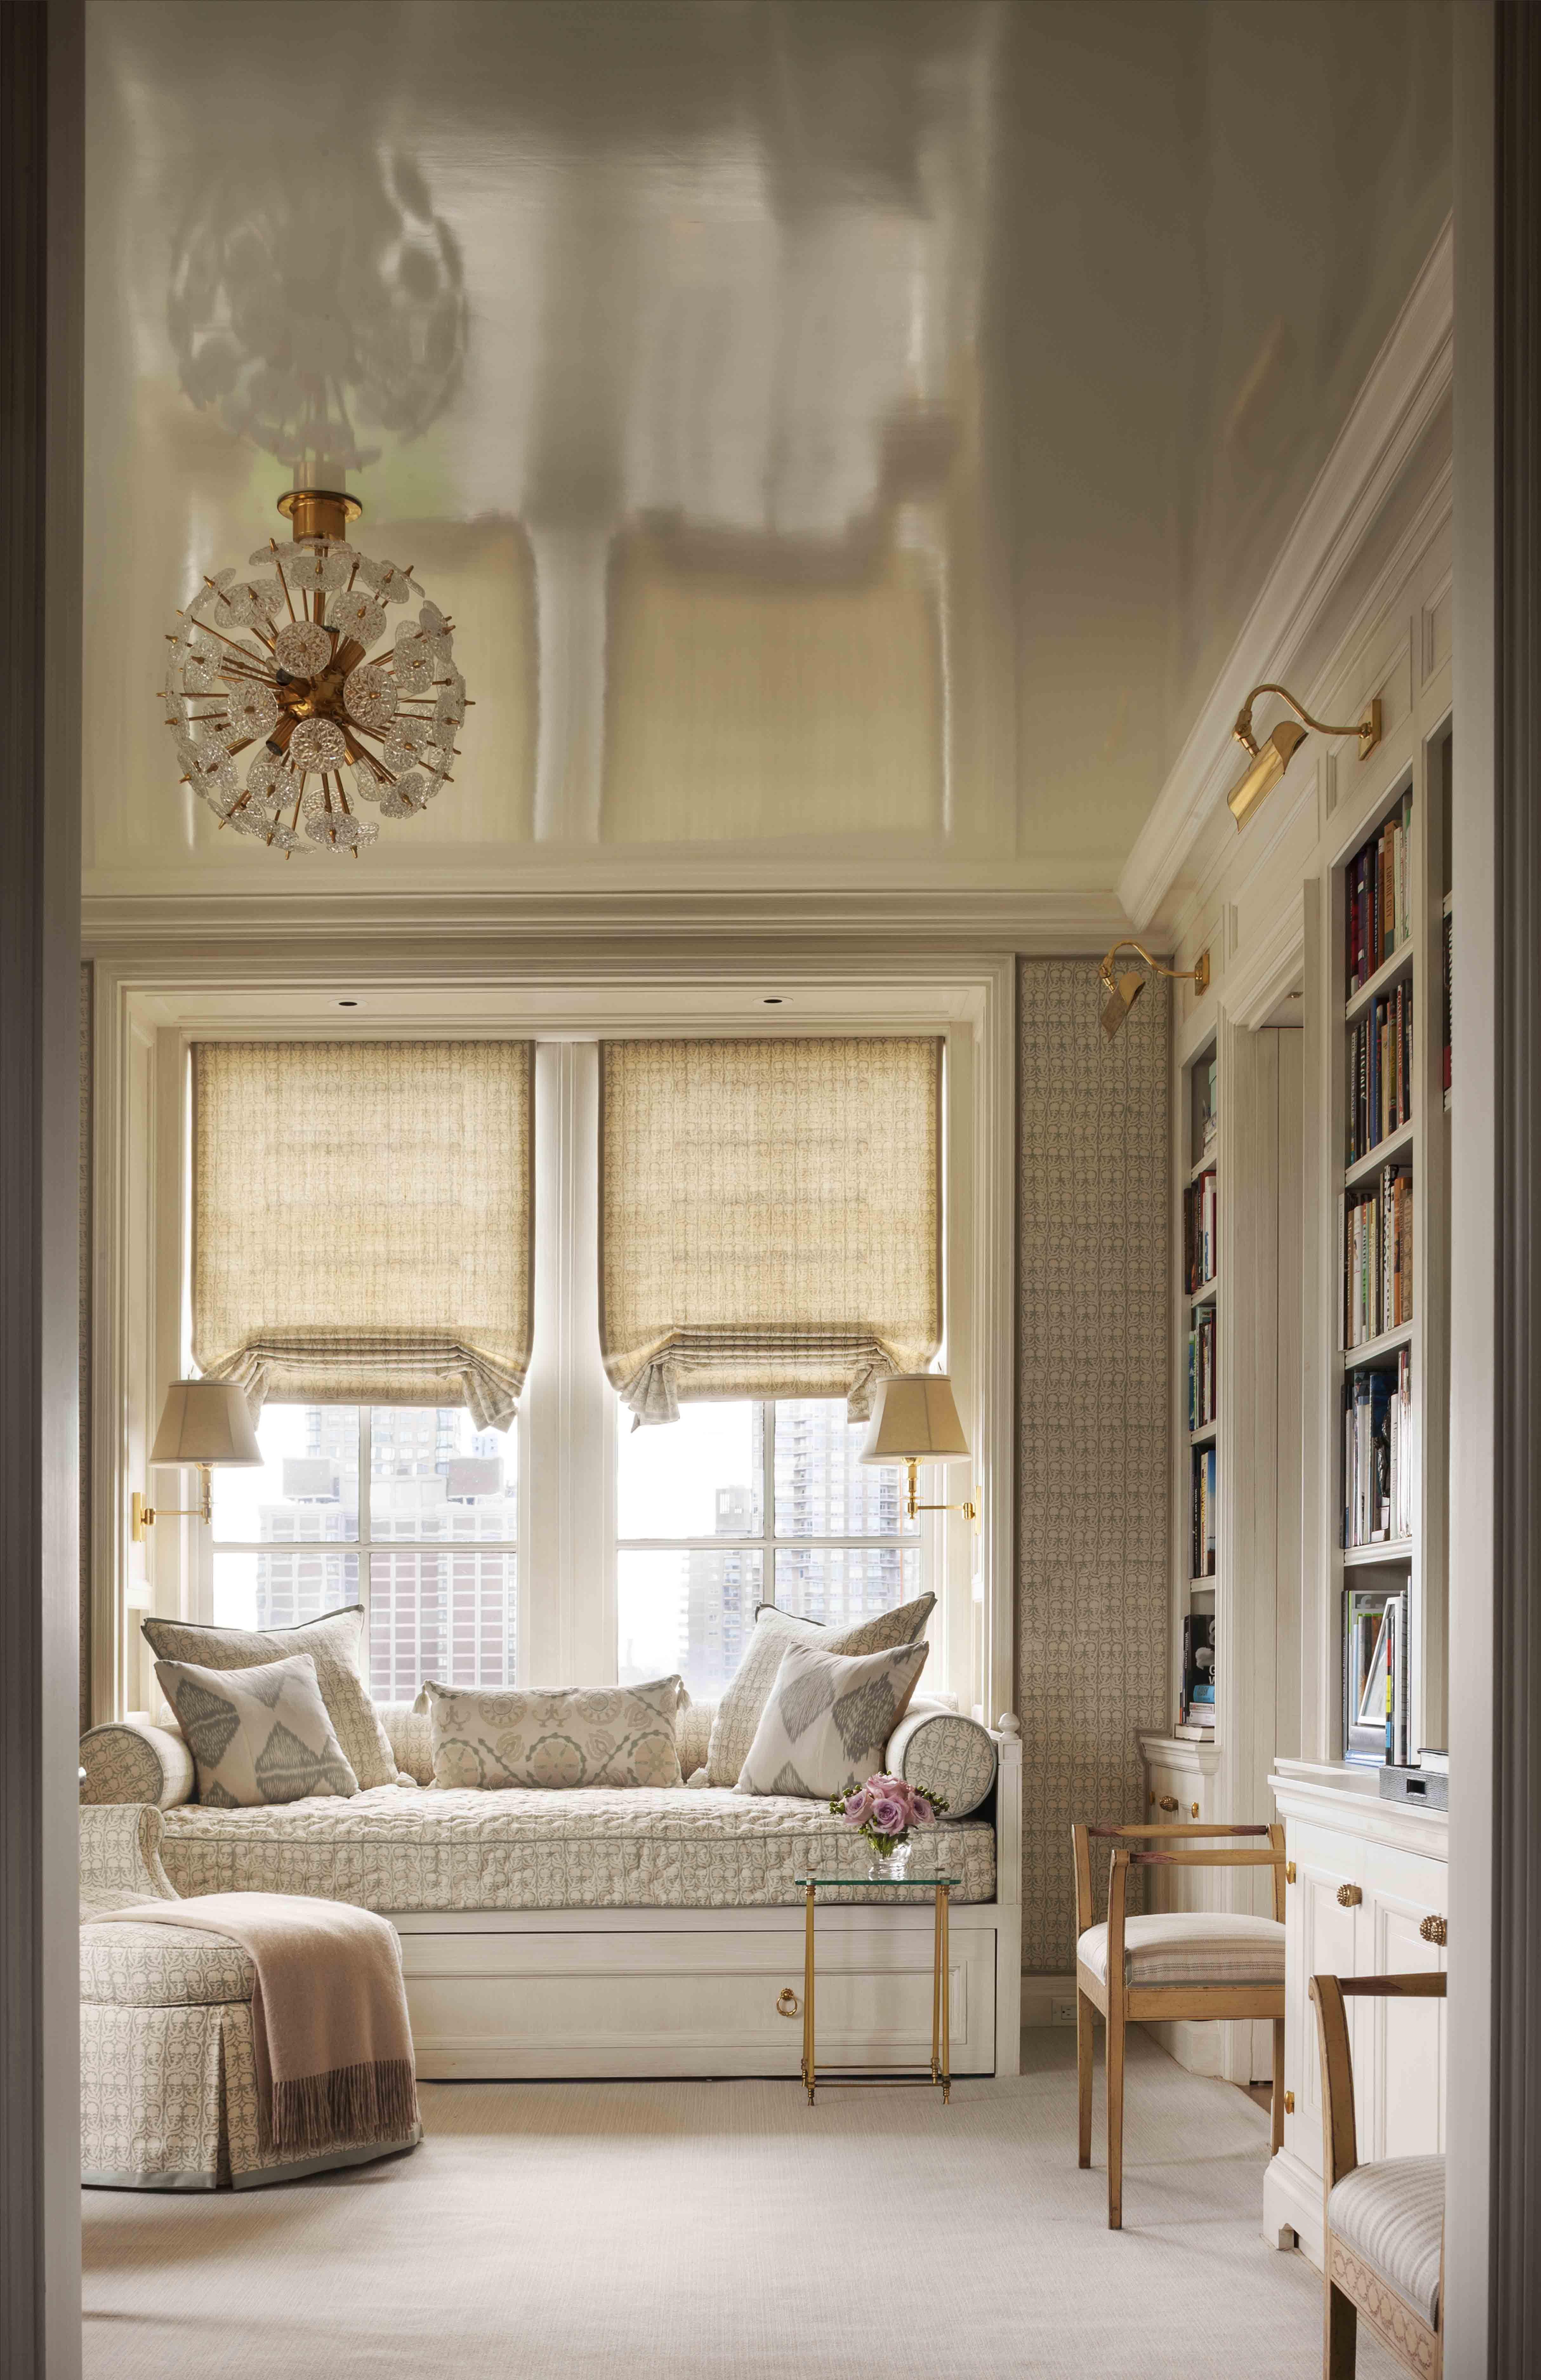 3 window bedroom ideas  library window seat  john b murray architect  family room ideas